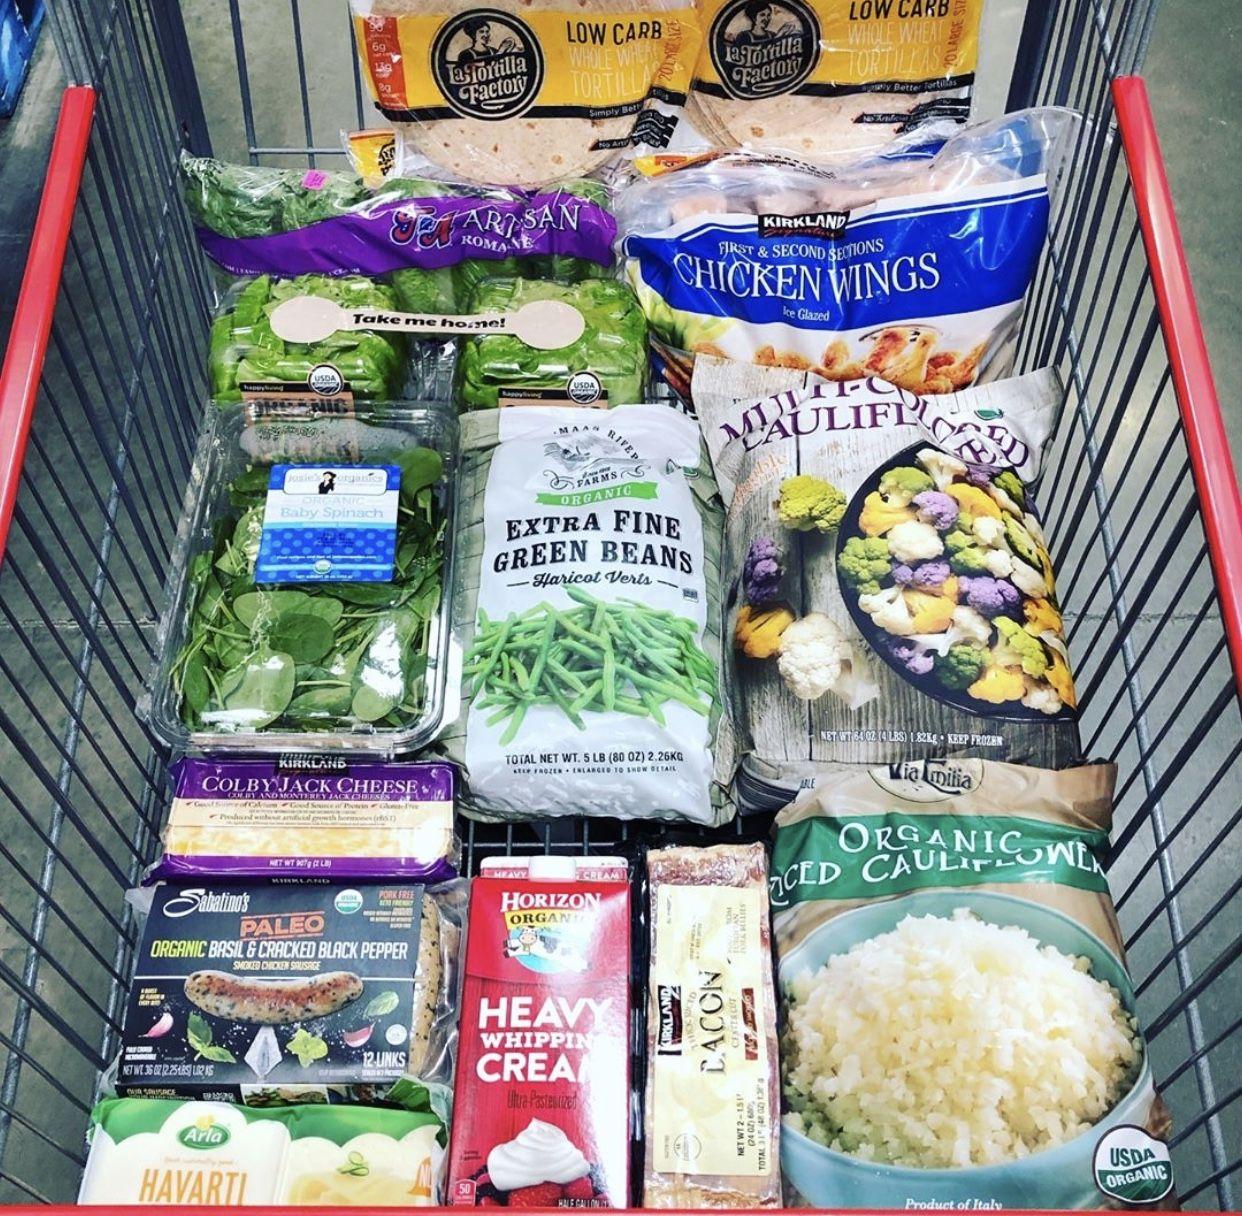 Costco Keto Friendly Food Haul Keto, Food, Grocery haul